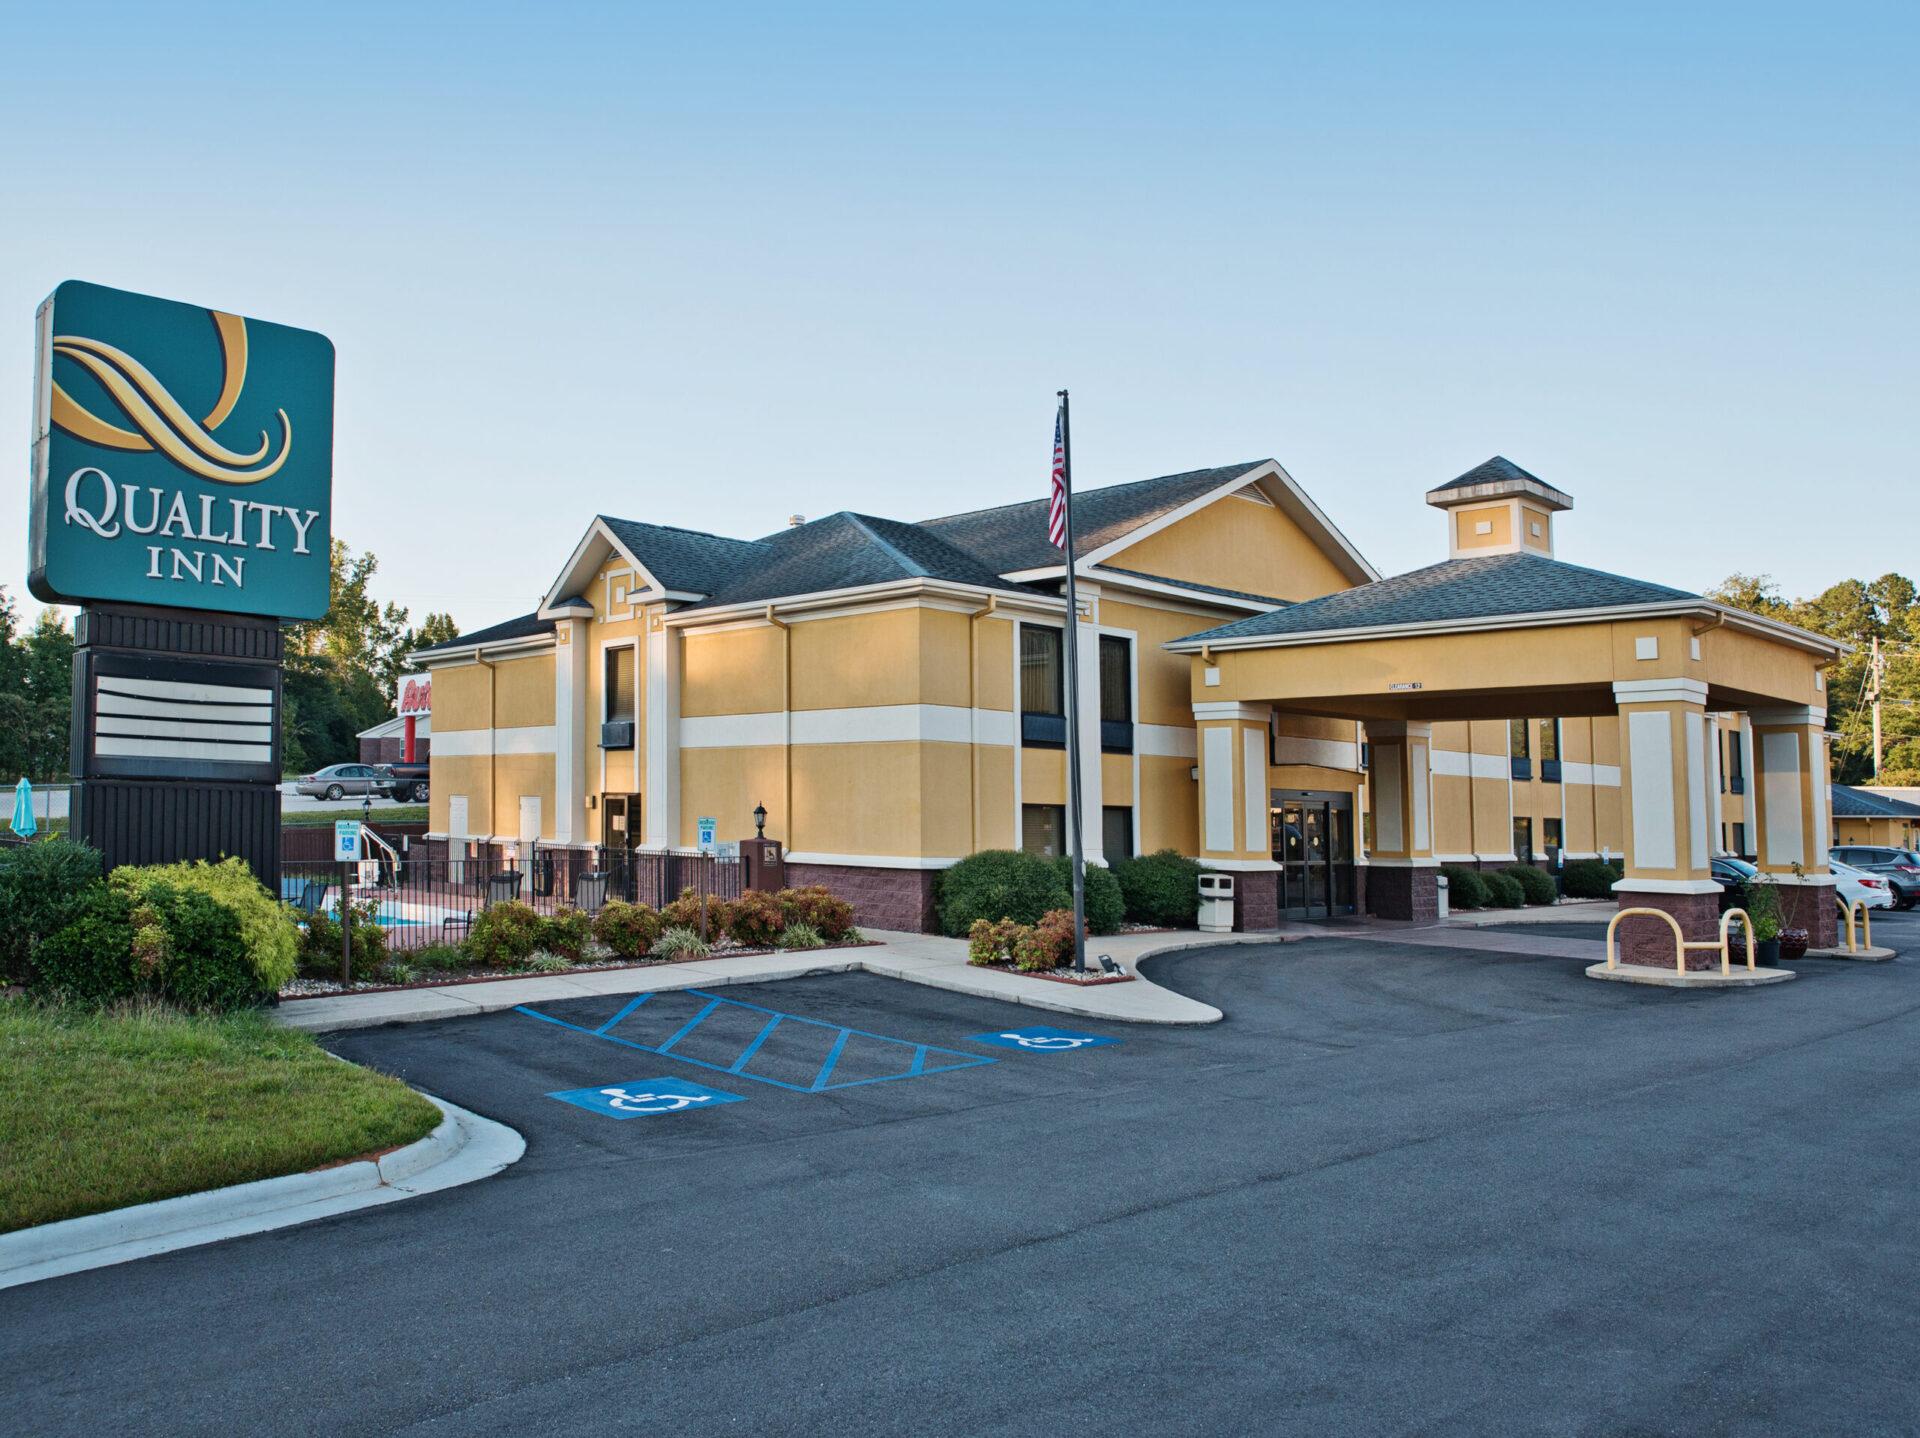 Quality Inn Alexander City, AL